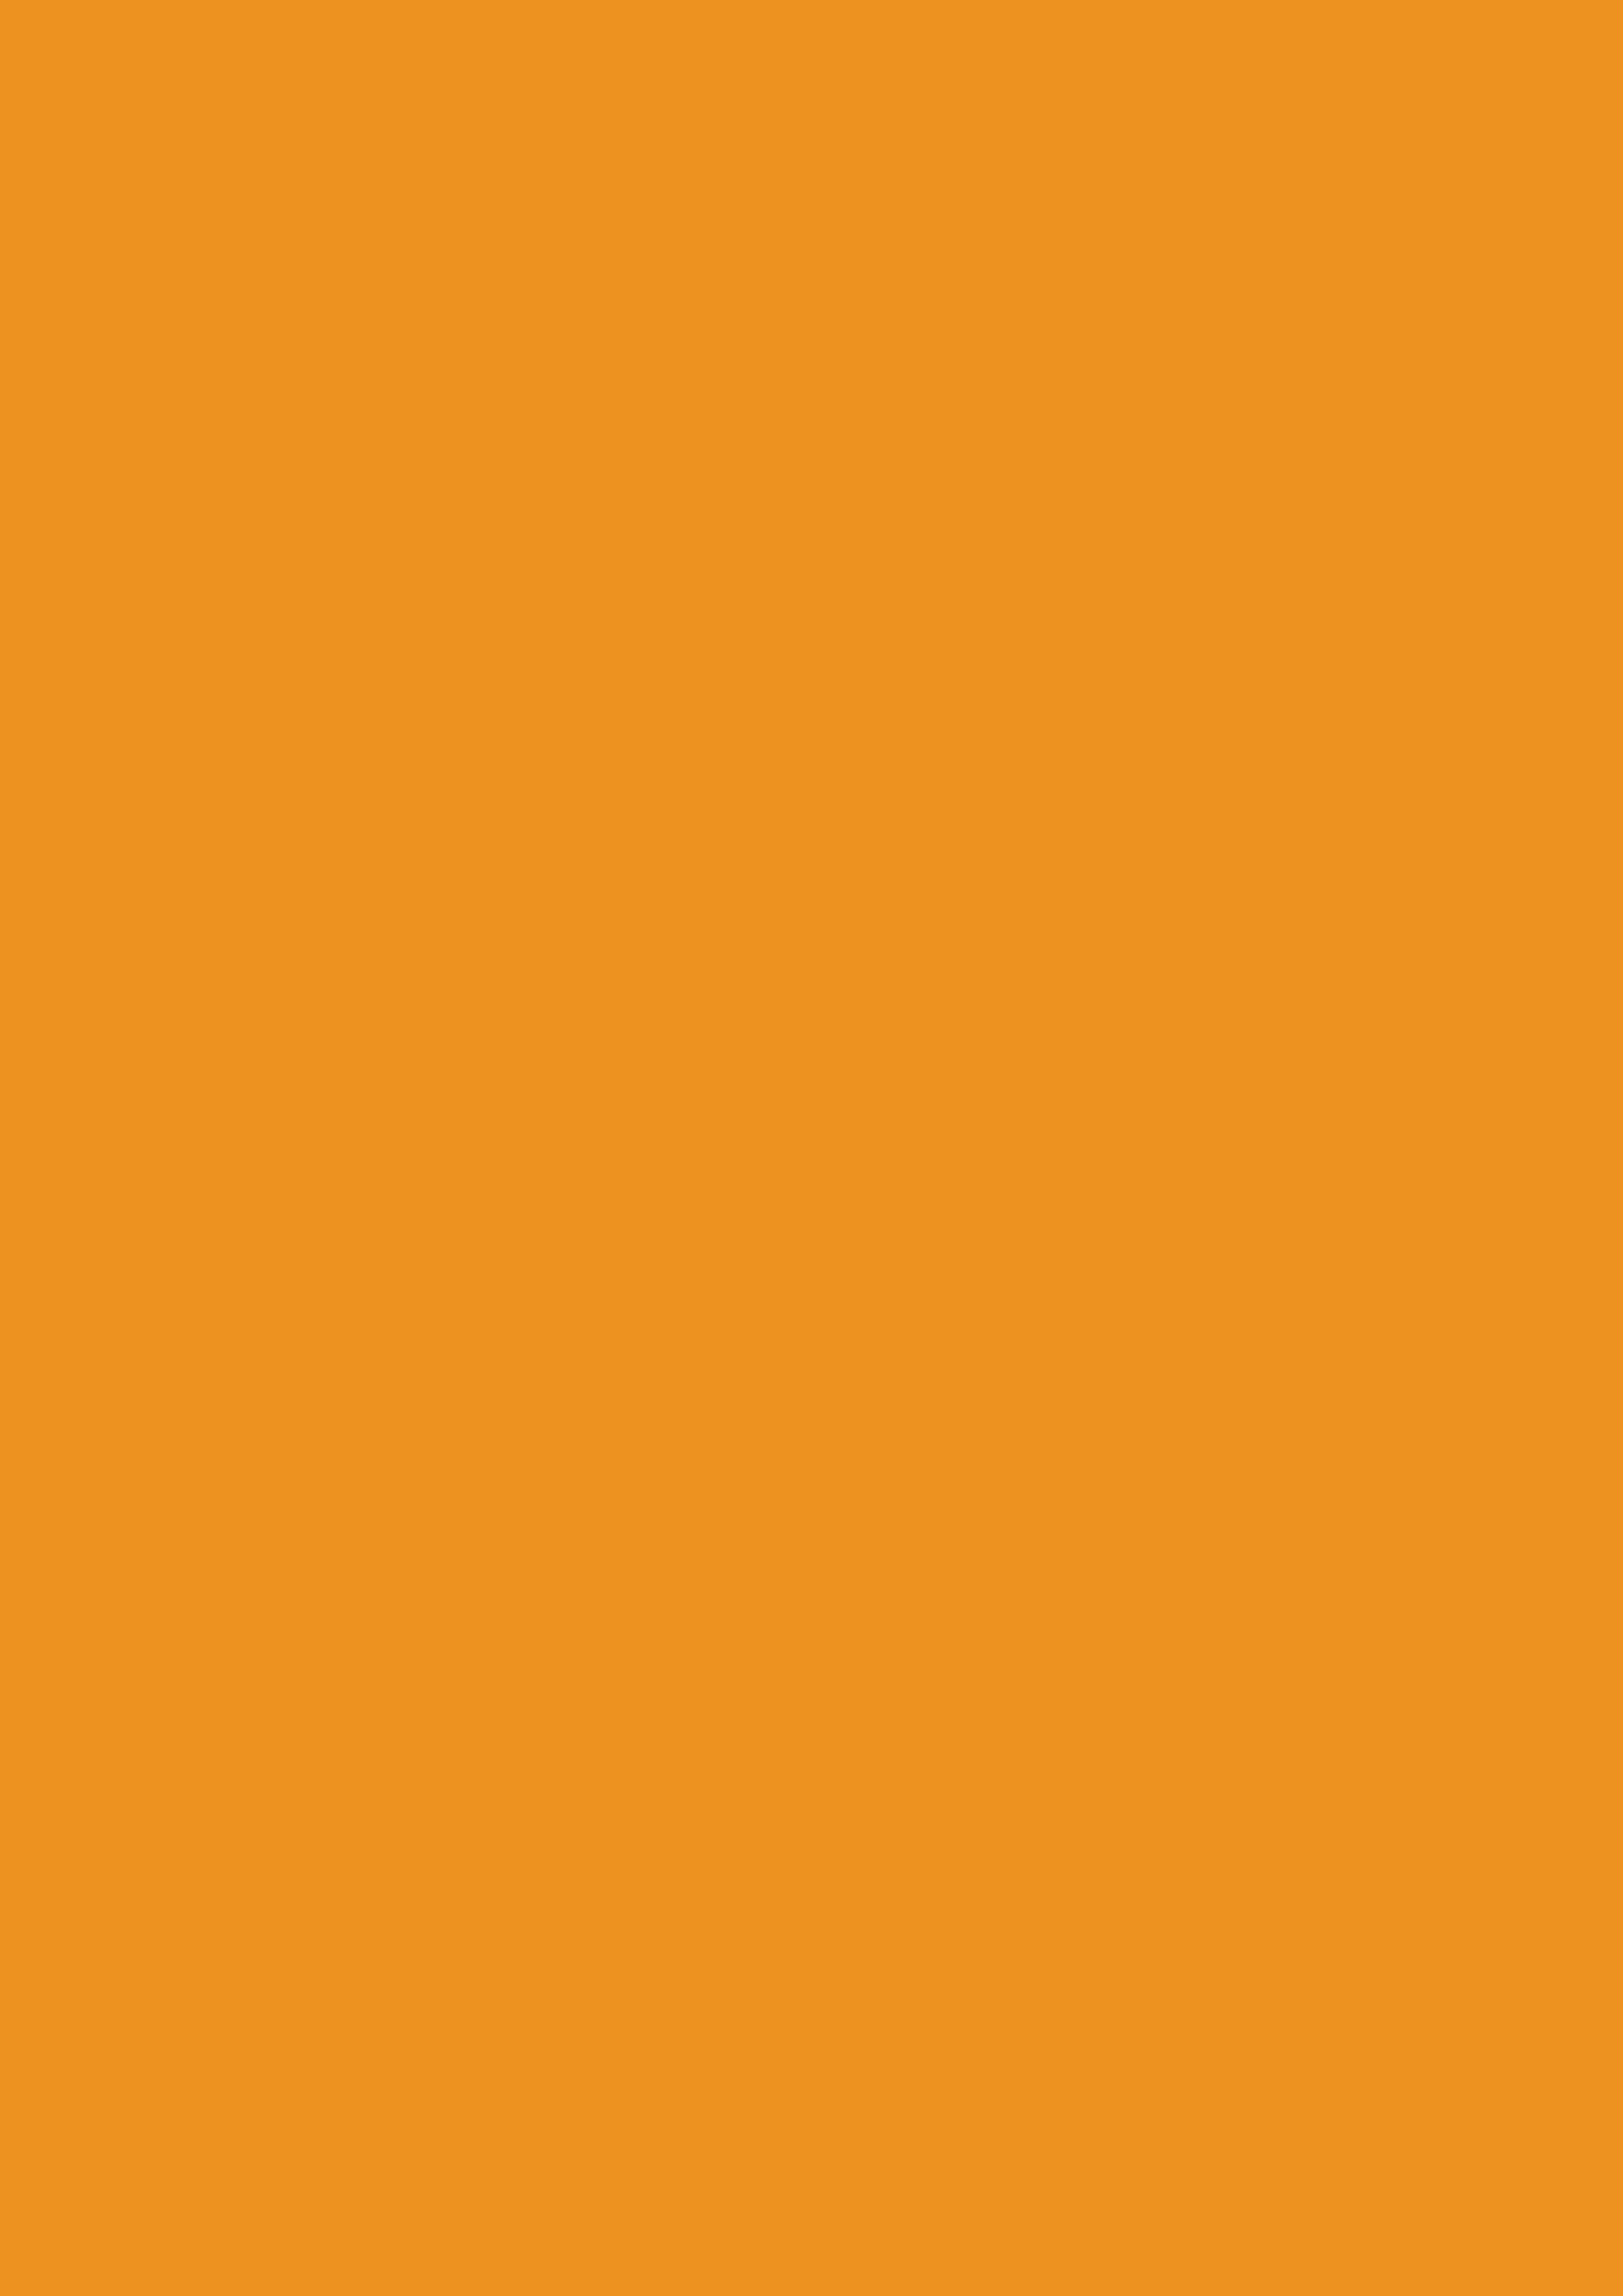 2480x3508 Carrot Orange Solid Color Background